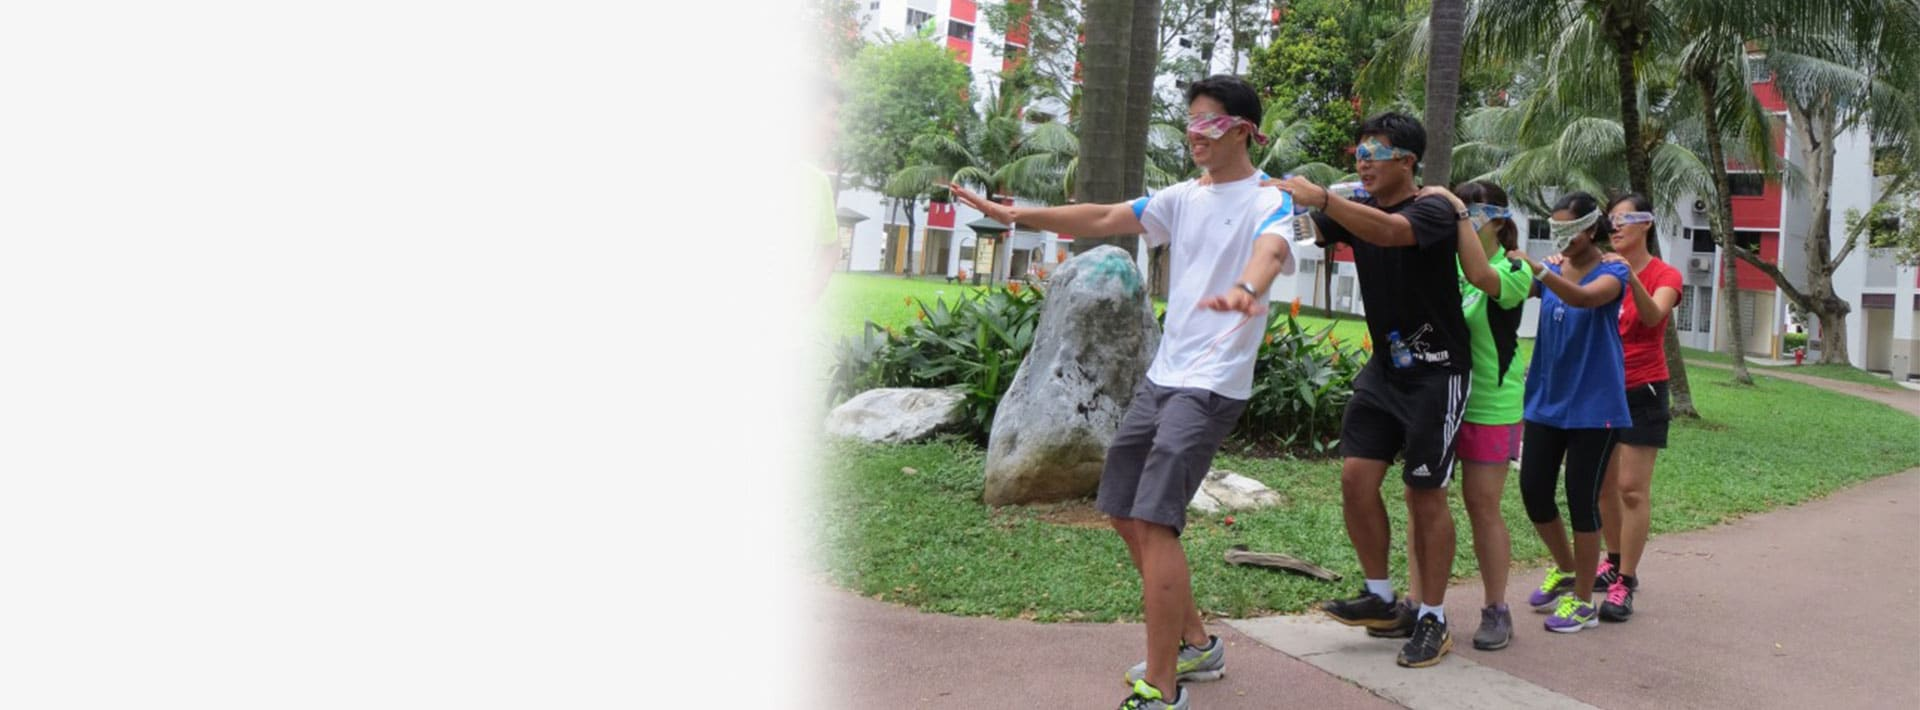 Experiental Learning Workshop Erlebnispädagogik in Singapur Blogbeitrag